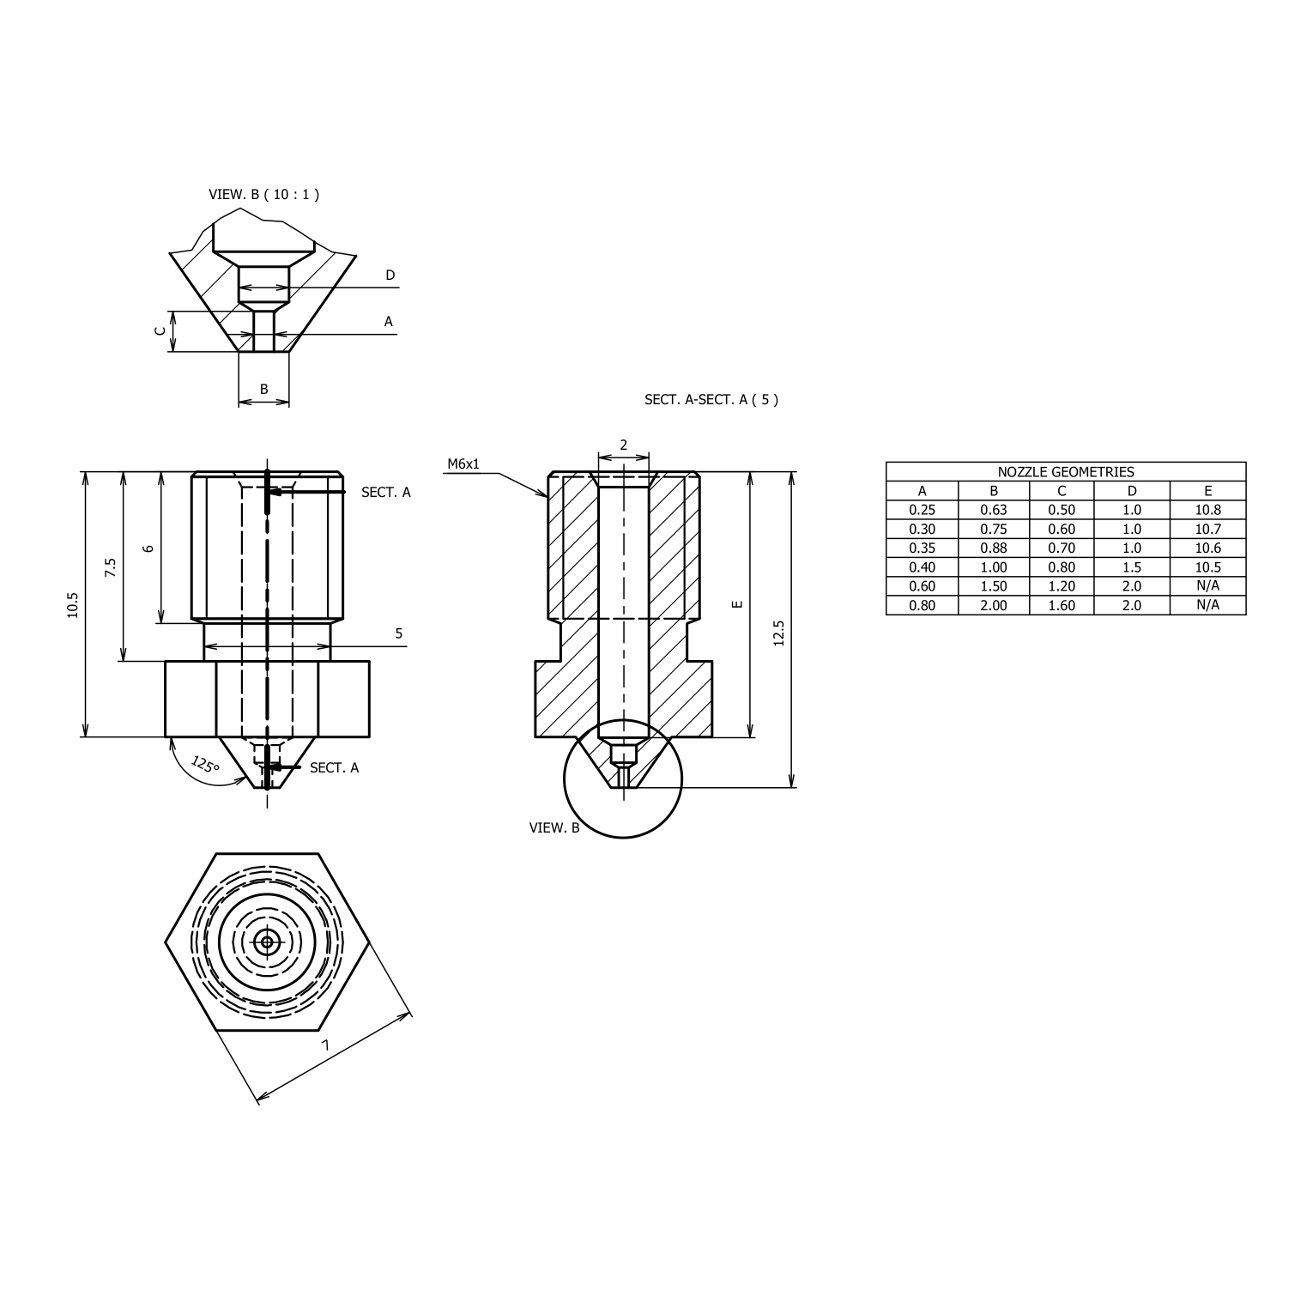 WINSINN Technology Ltd WINSINN Stainless Steel Nozzle 0.4mm V6 for 3D Printer Hotend Extruder 1.75mm Filament Pack of 10Pcs